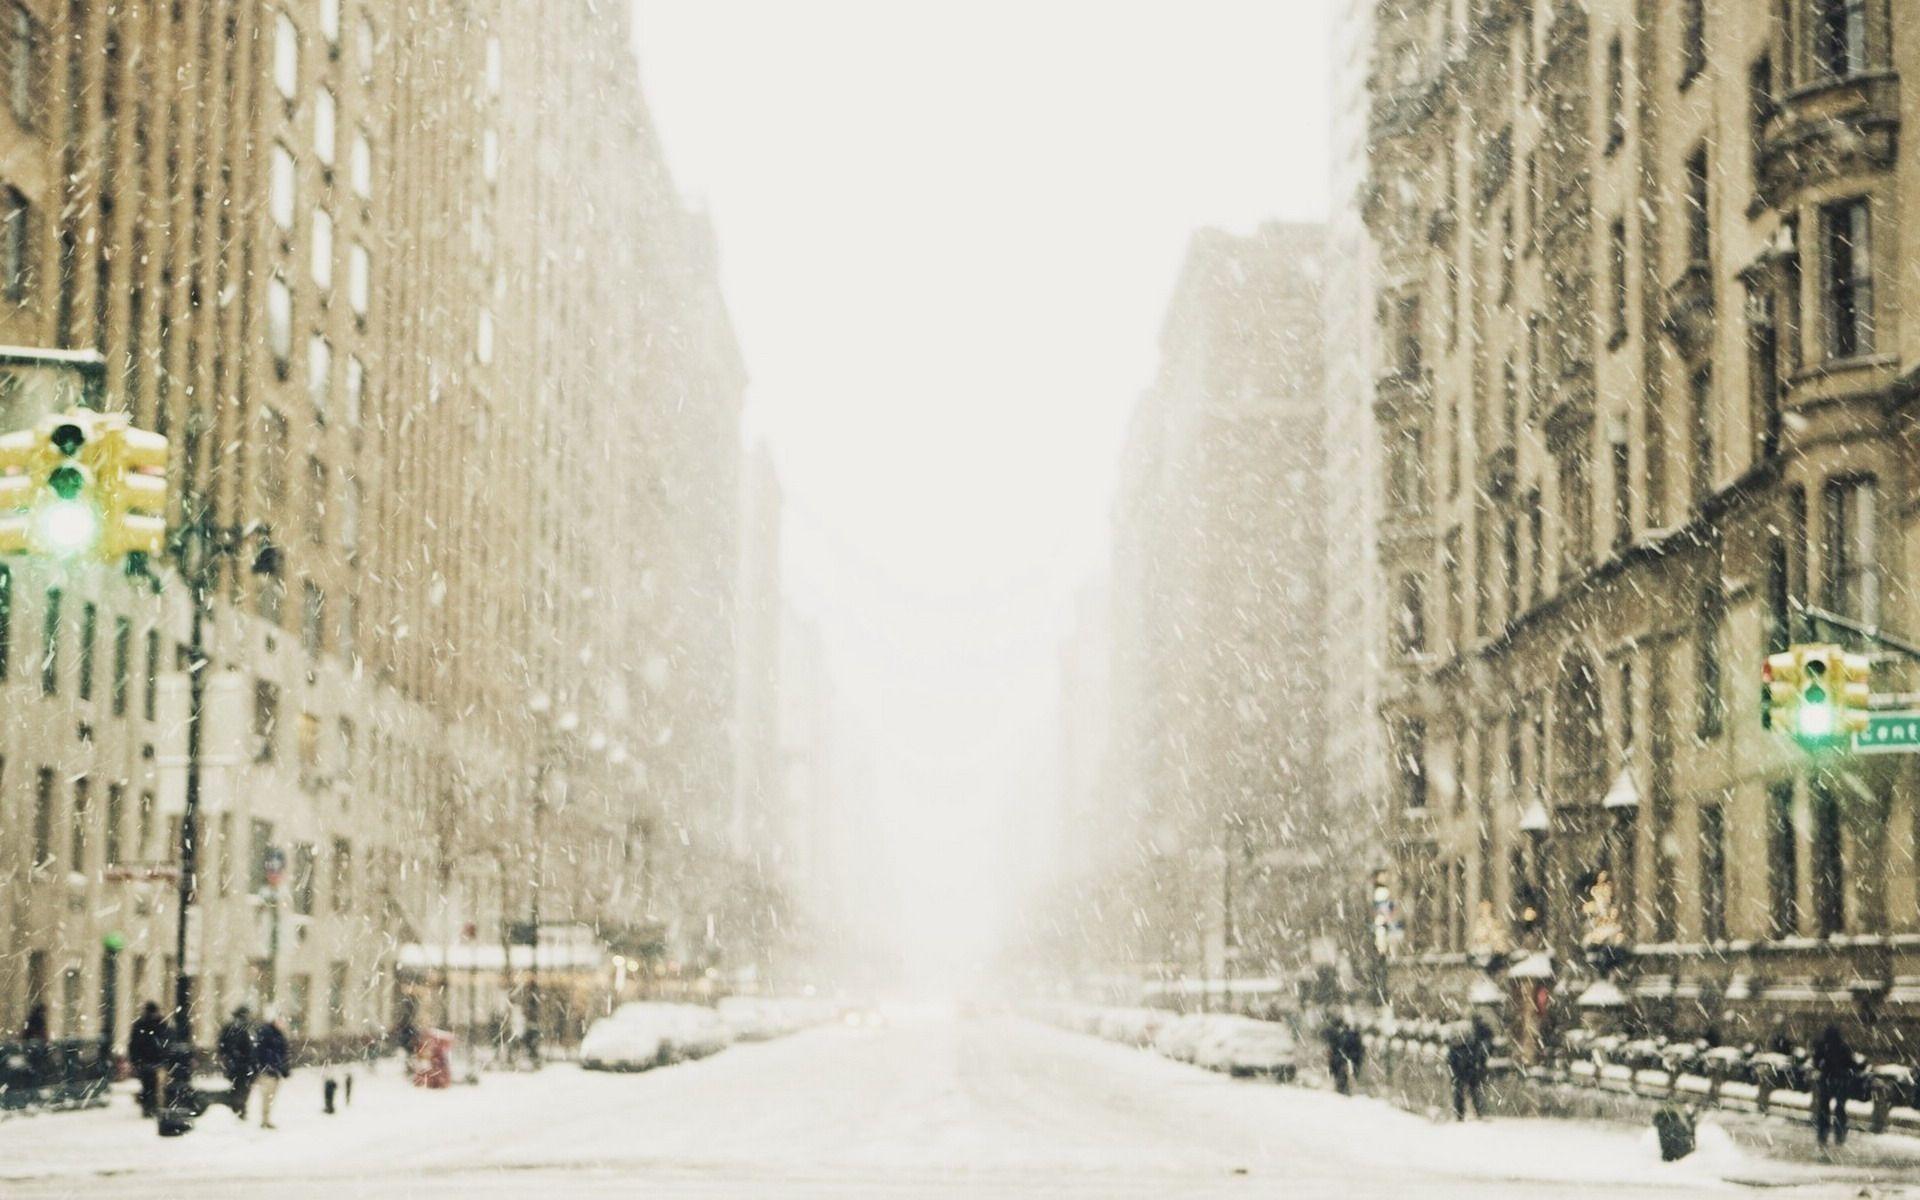 Winter Snow City Street Metropolis wallpaper | Background HD .